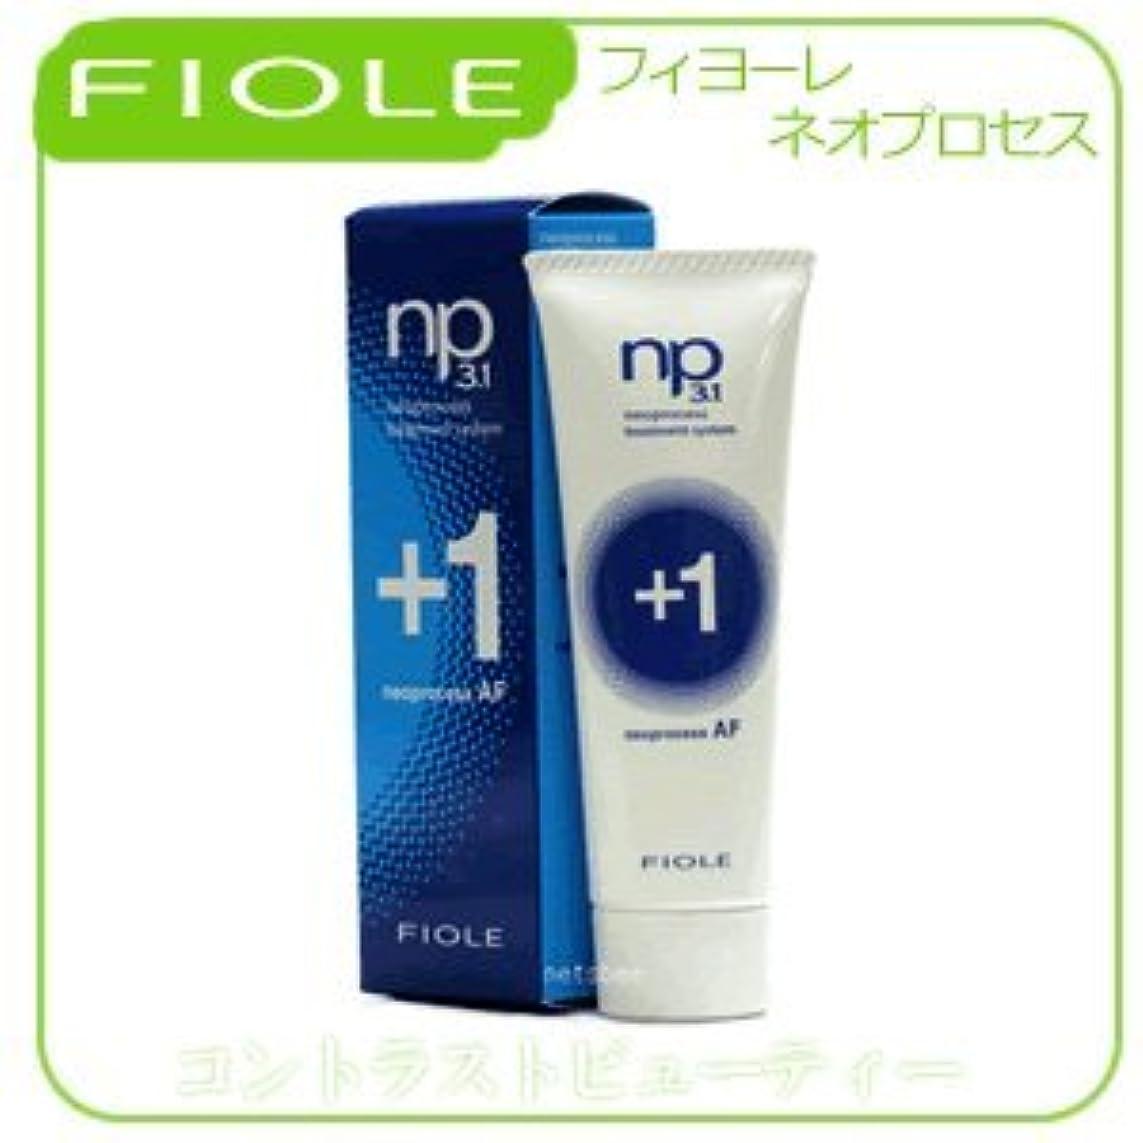 【X5個セット】 フィヨーレ NP3.1 ネオプロセス AFプラス1 100g FIOLE ネオプロセス